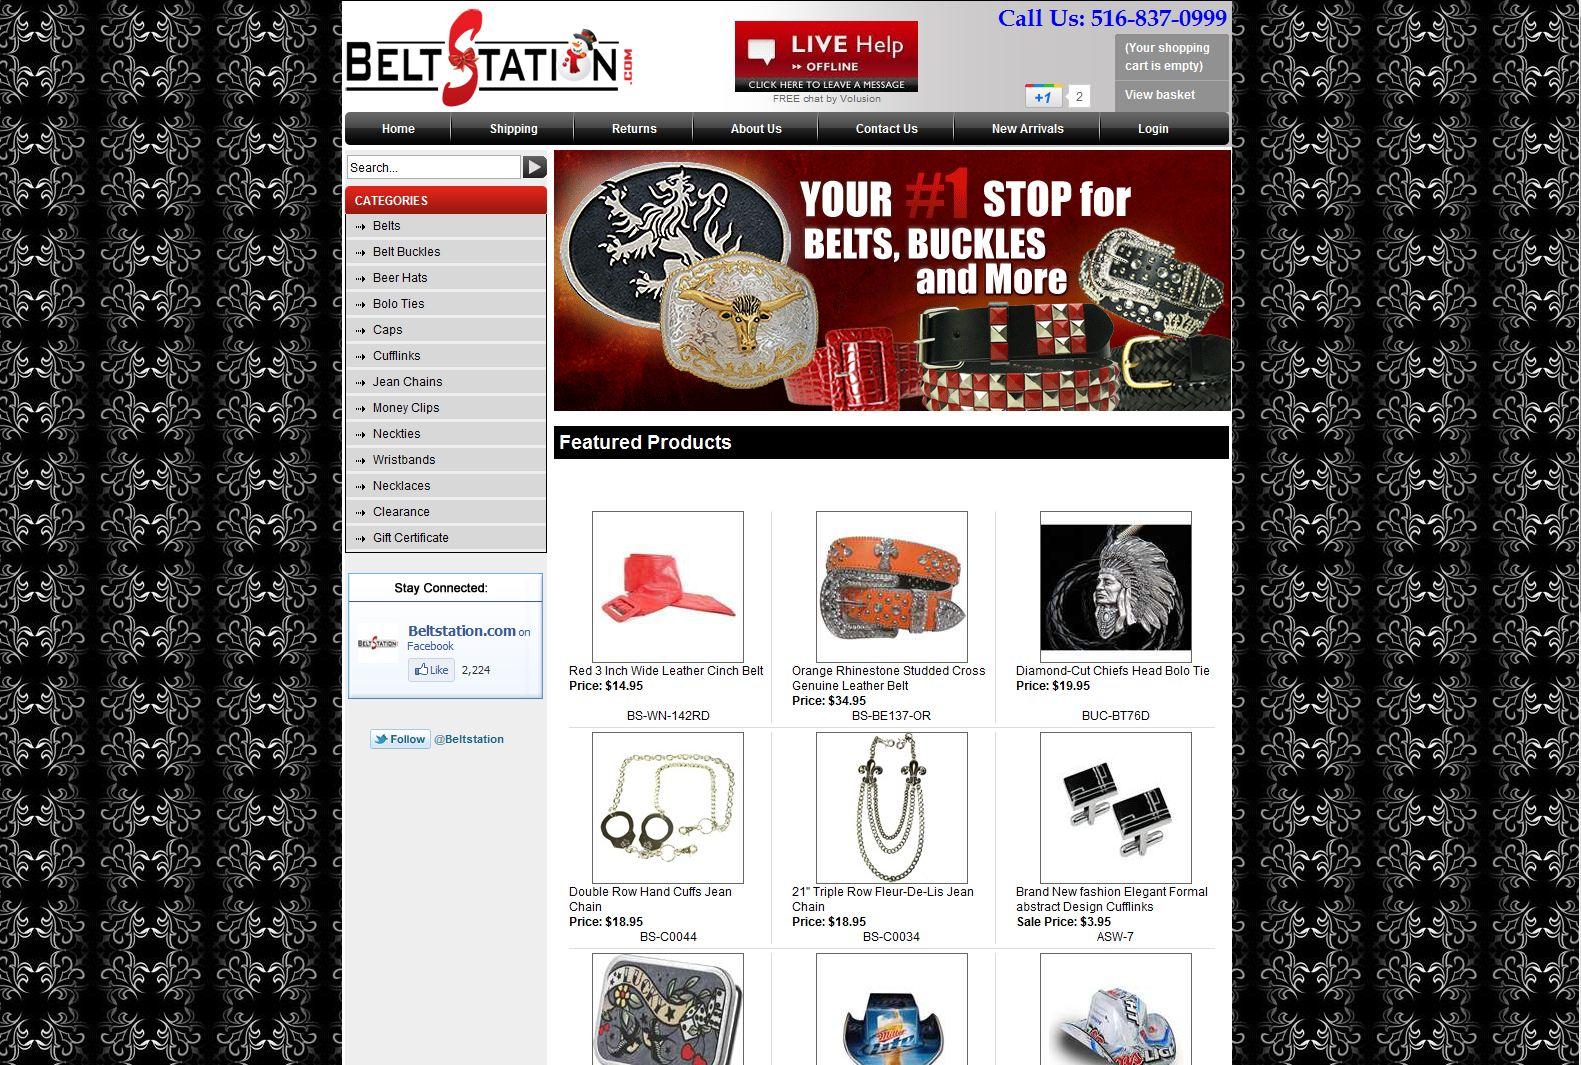 Beltstation.com